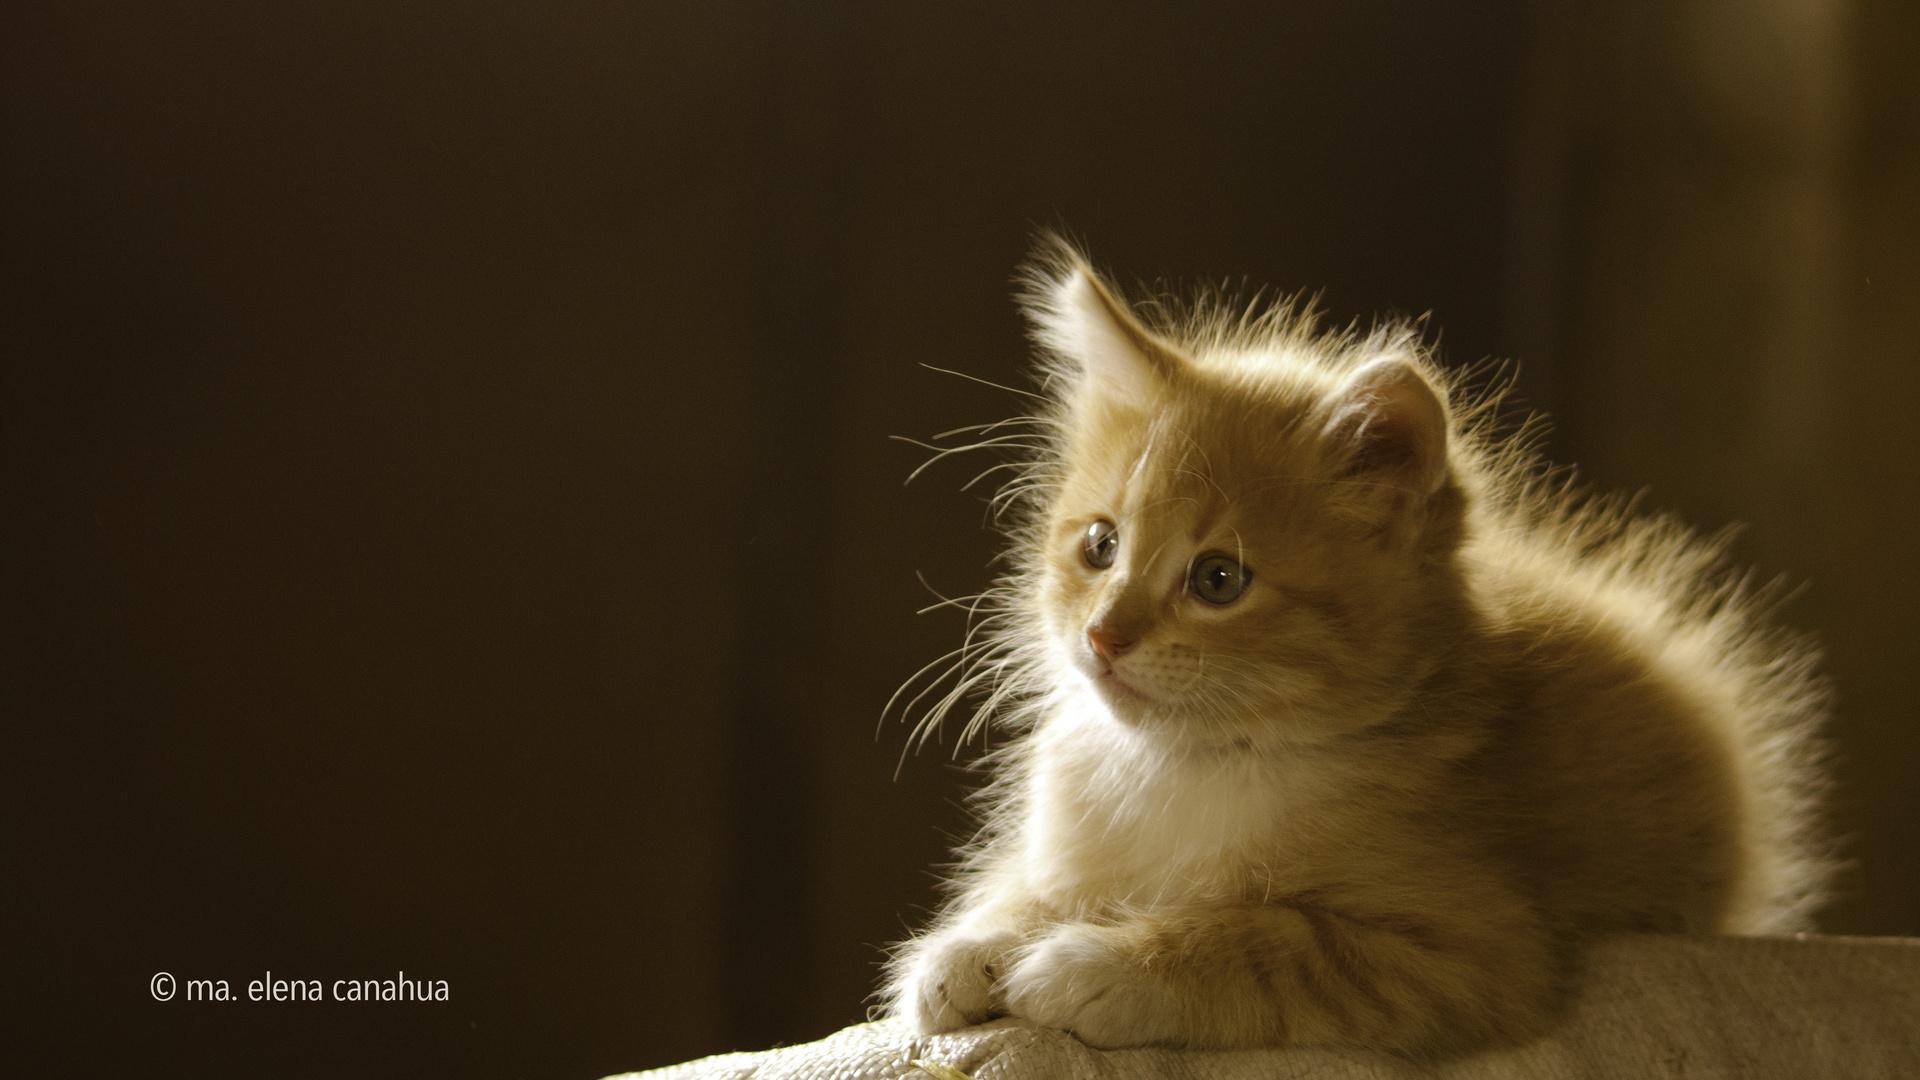 a kitty's portrait